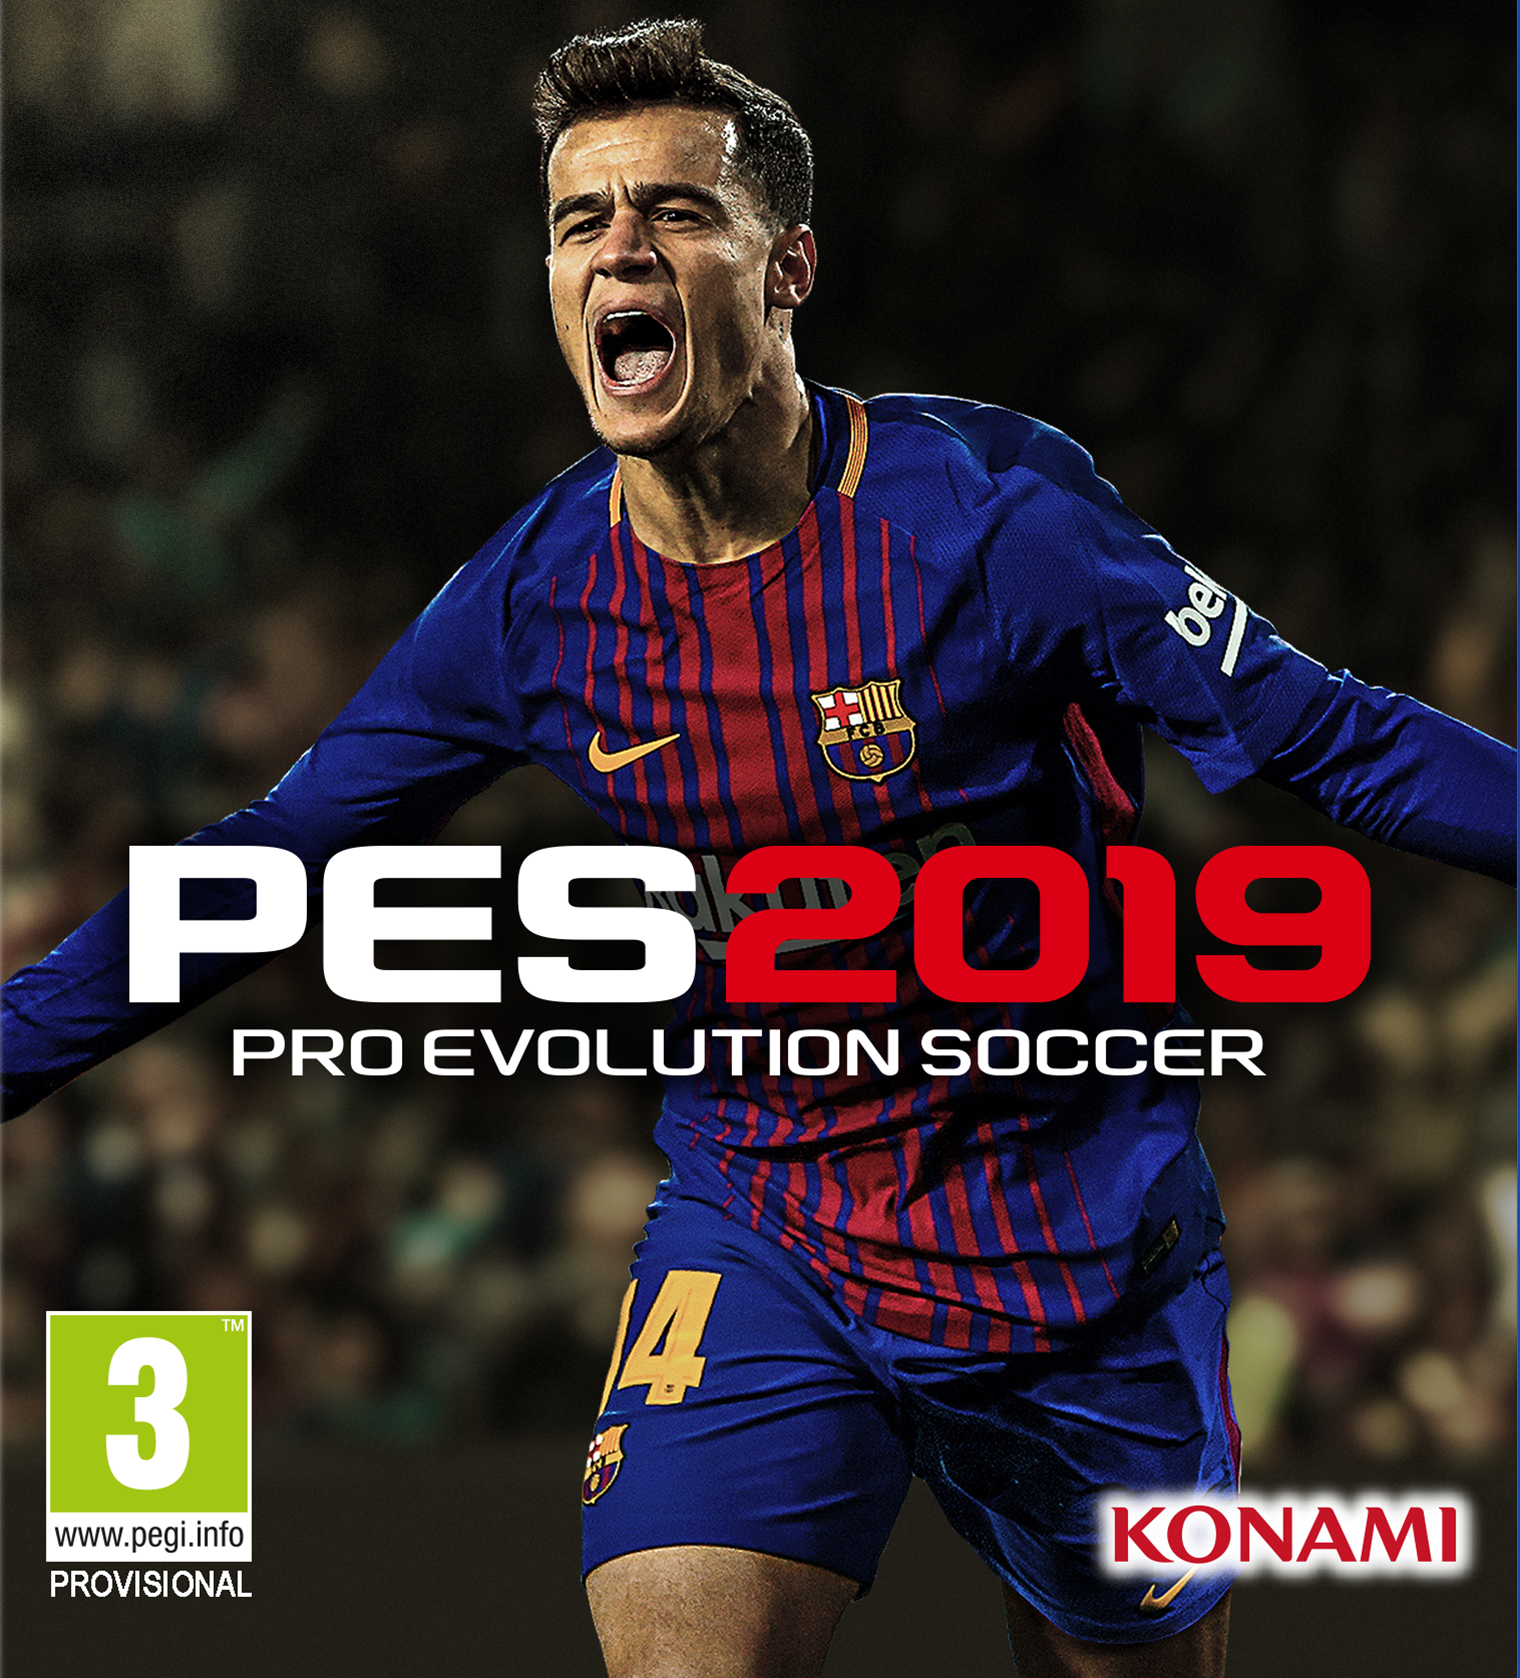 FIFA 21 boxart